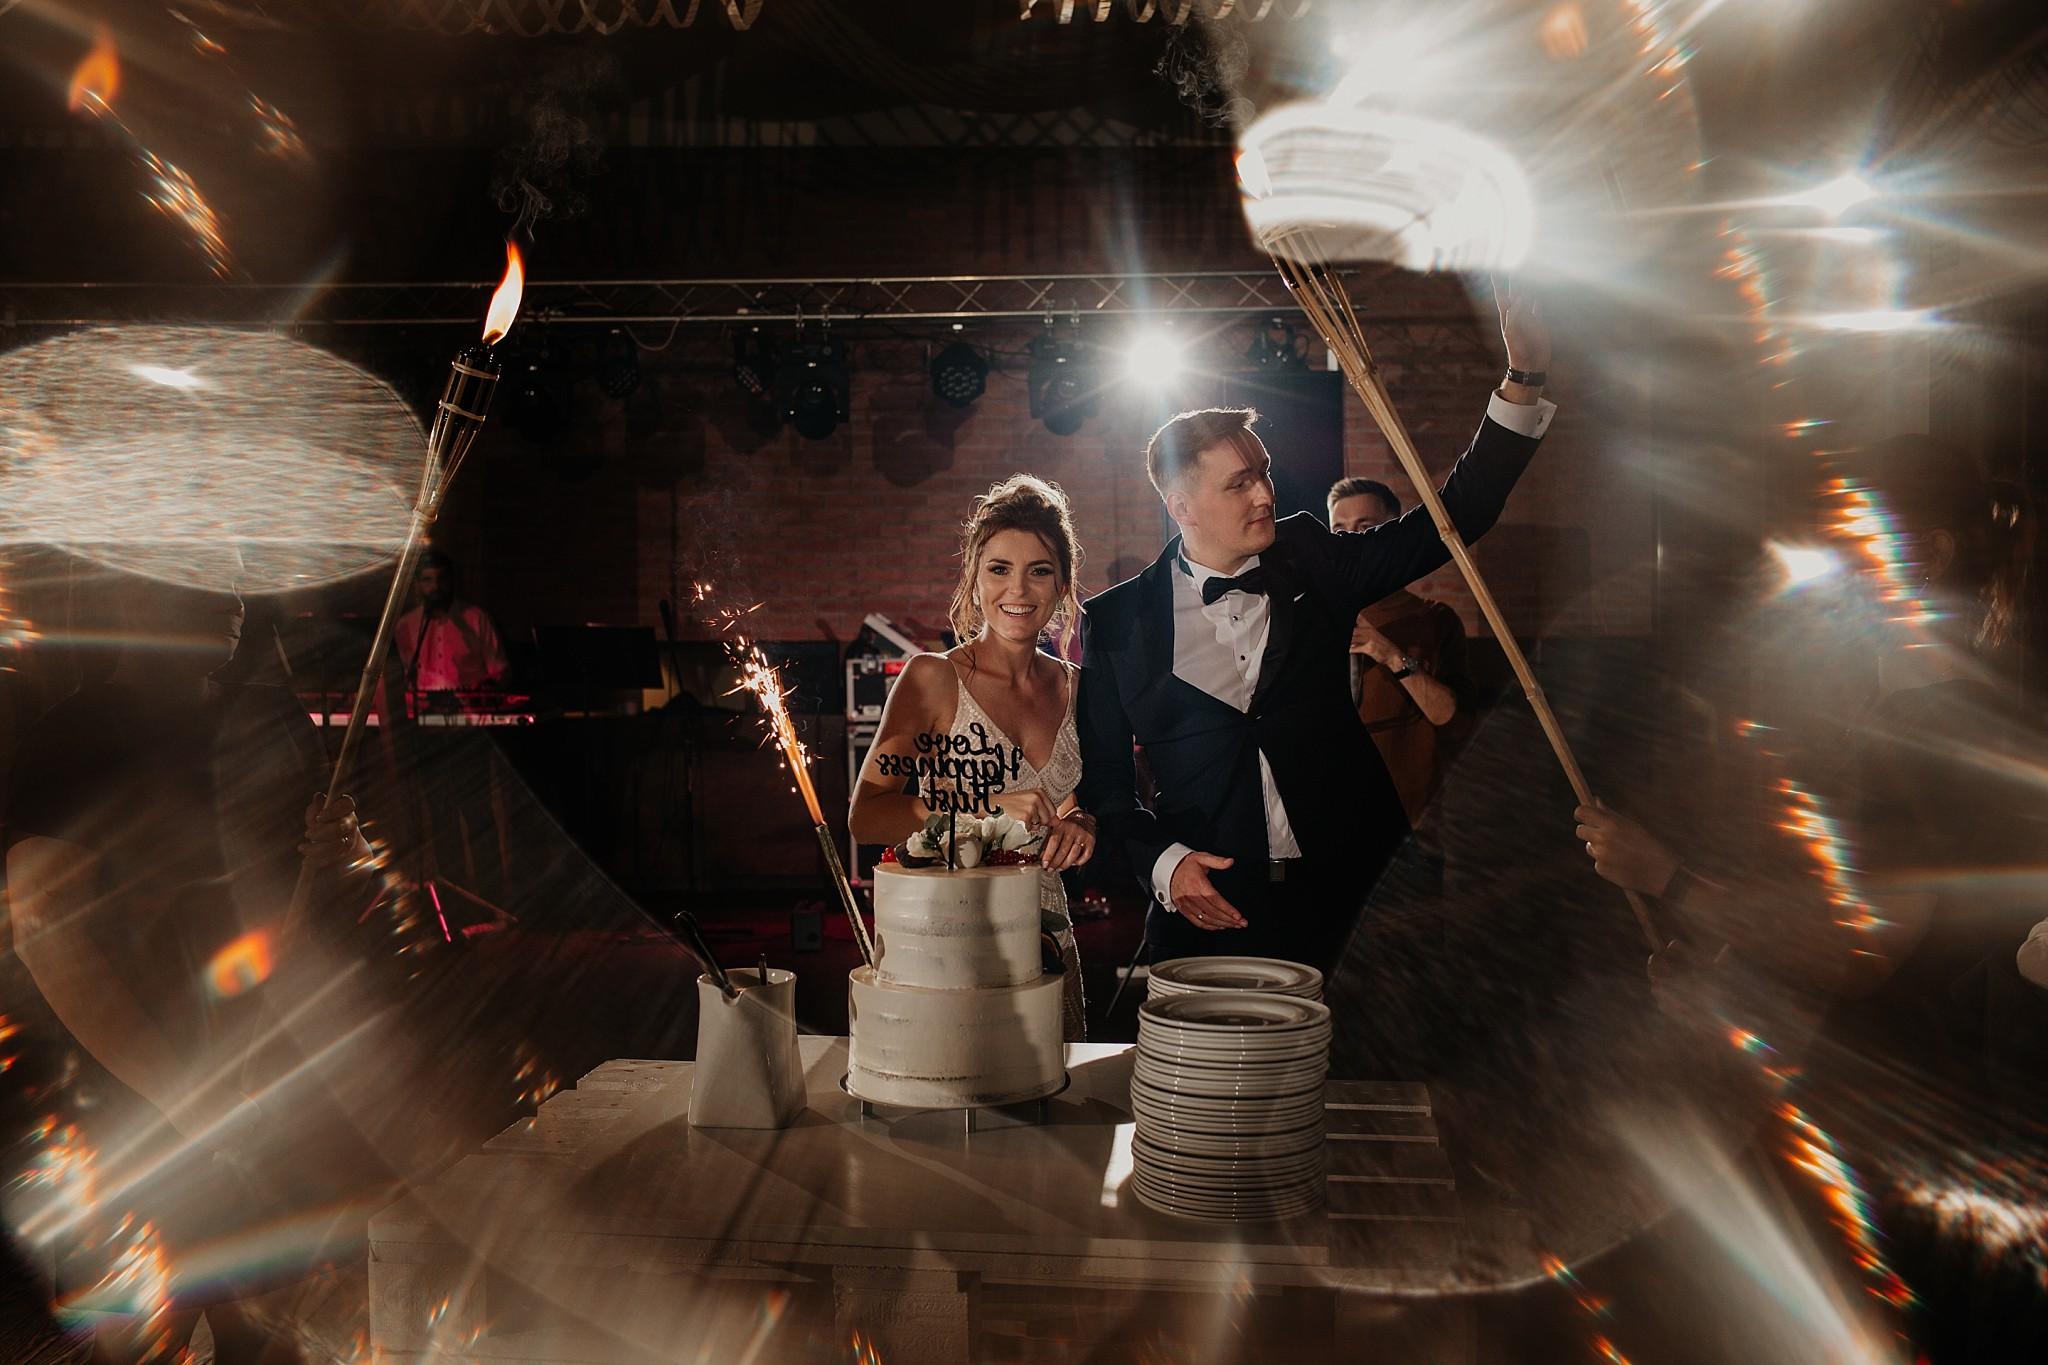 fotograf poznan wesele dobra truskawka piekne wesele pod poznaniem wesele w dobrej truskawce piekna para mloda slub marzen slub koronawirus slub listopad wesele koronawirus 498